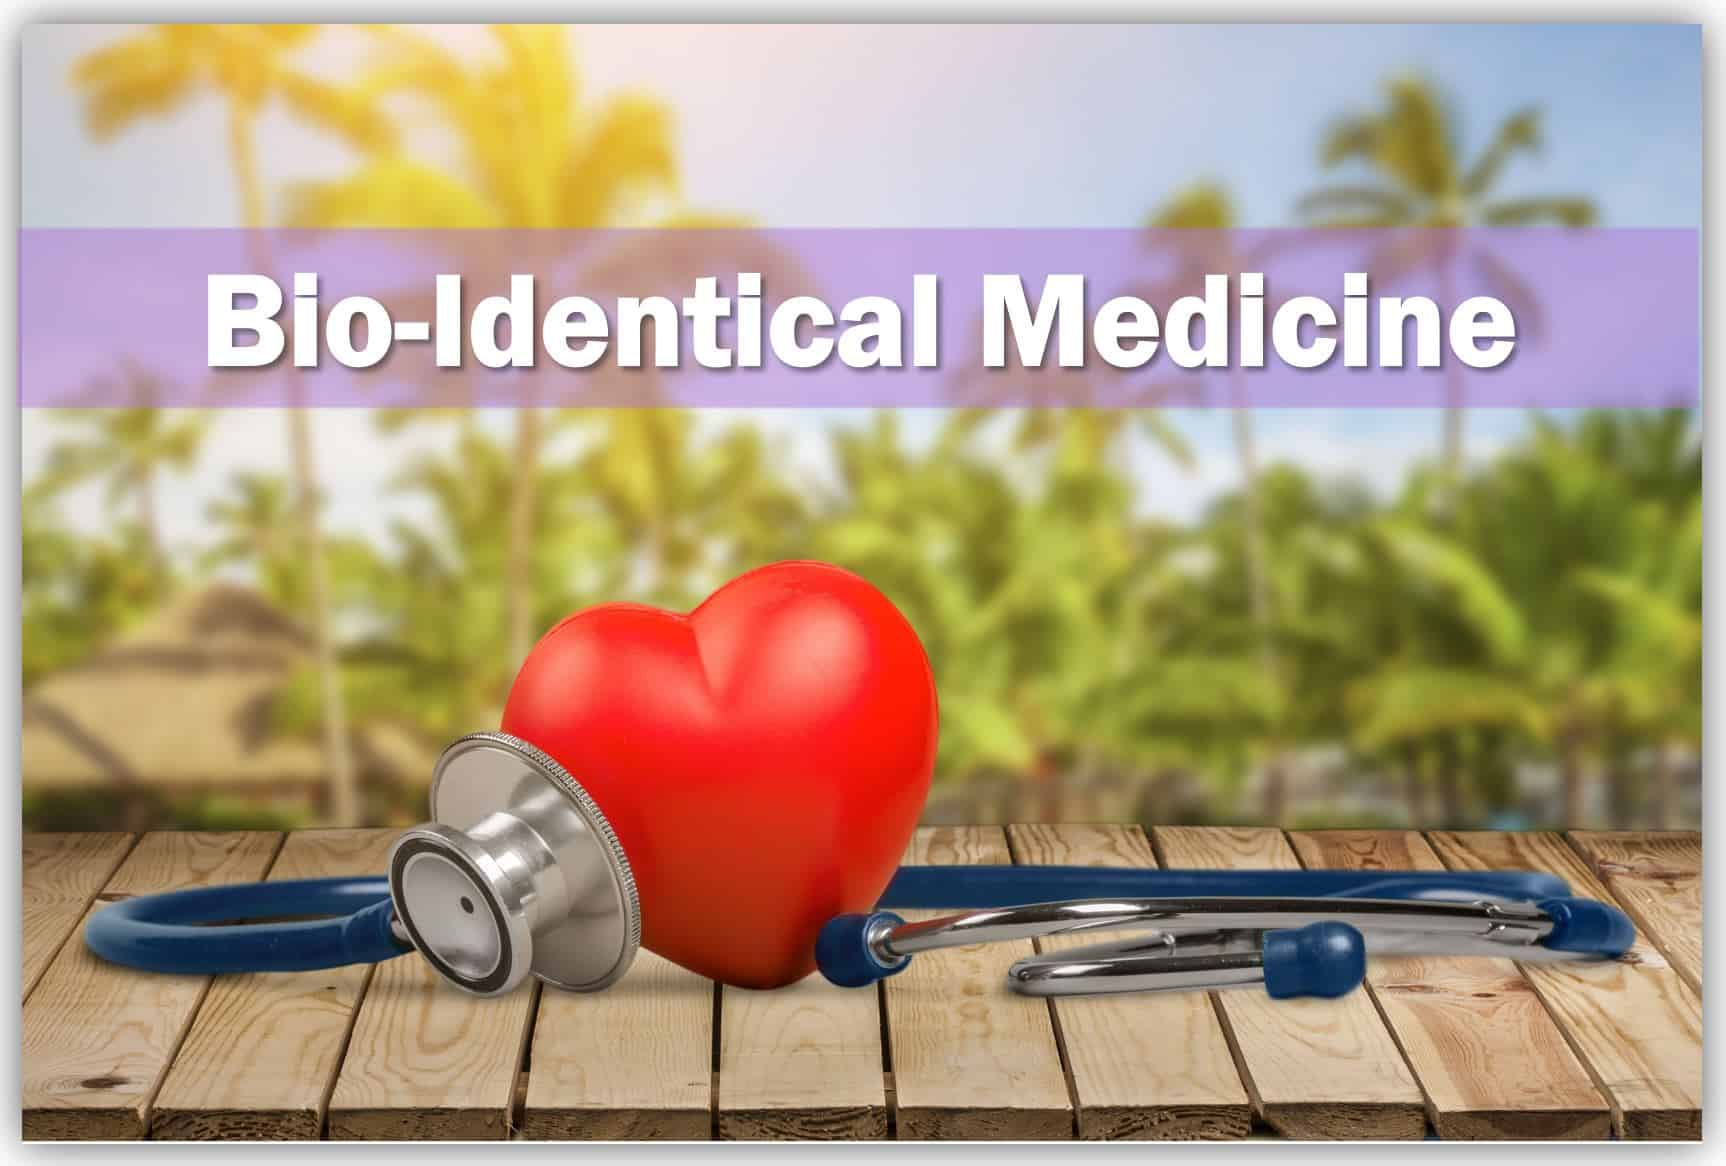 Bioidentical medicine